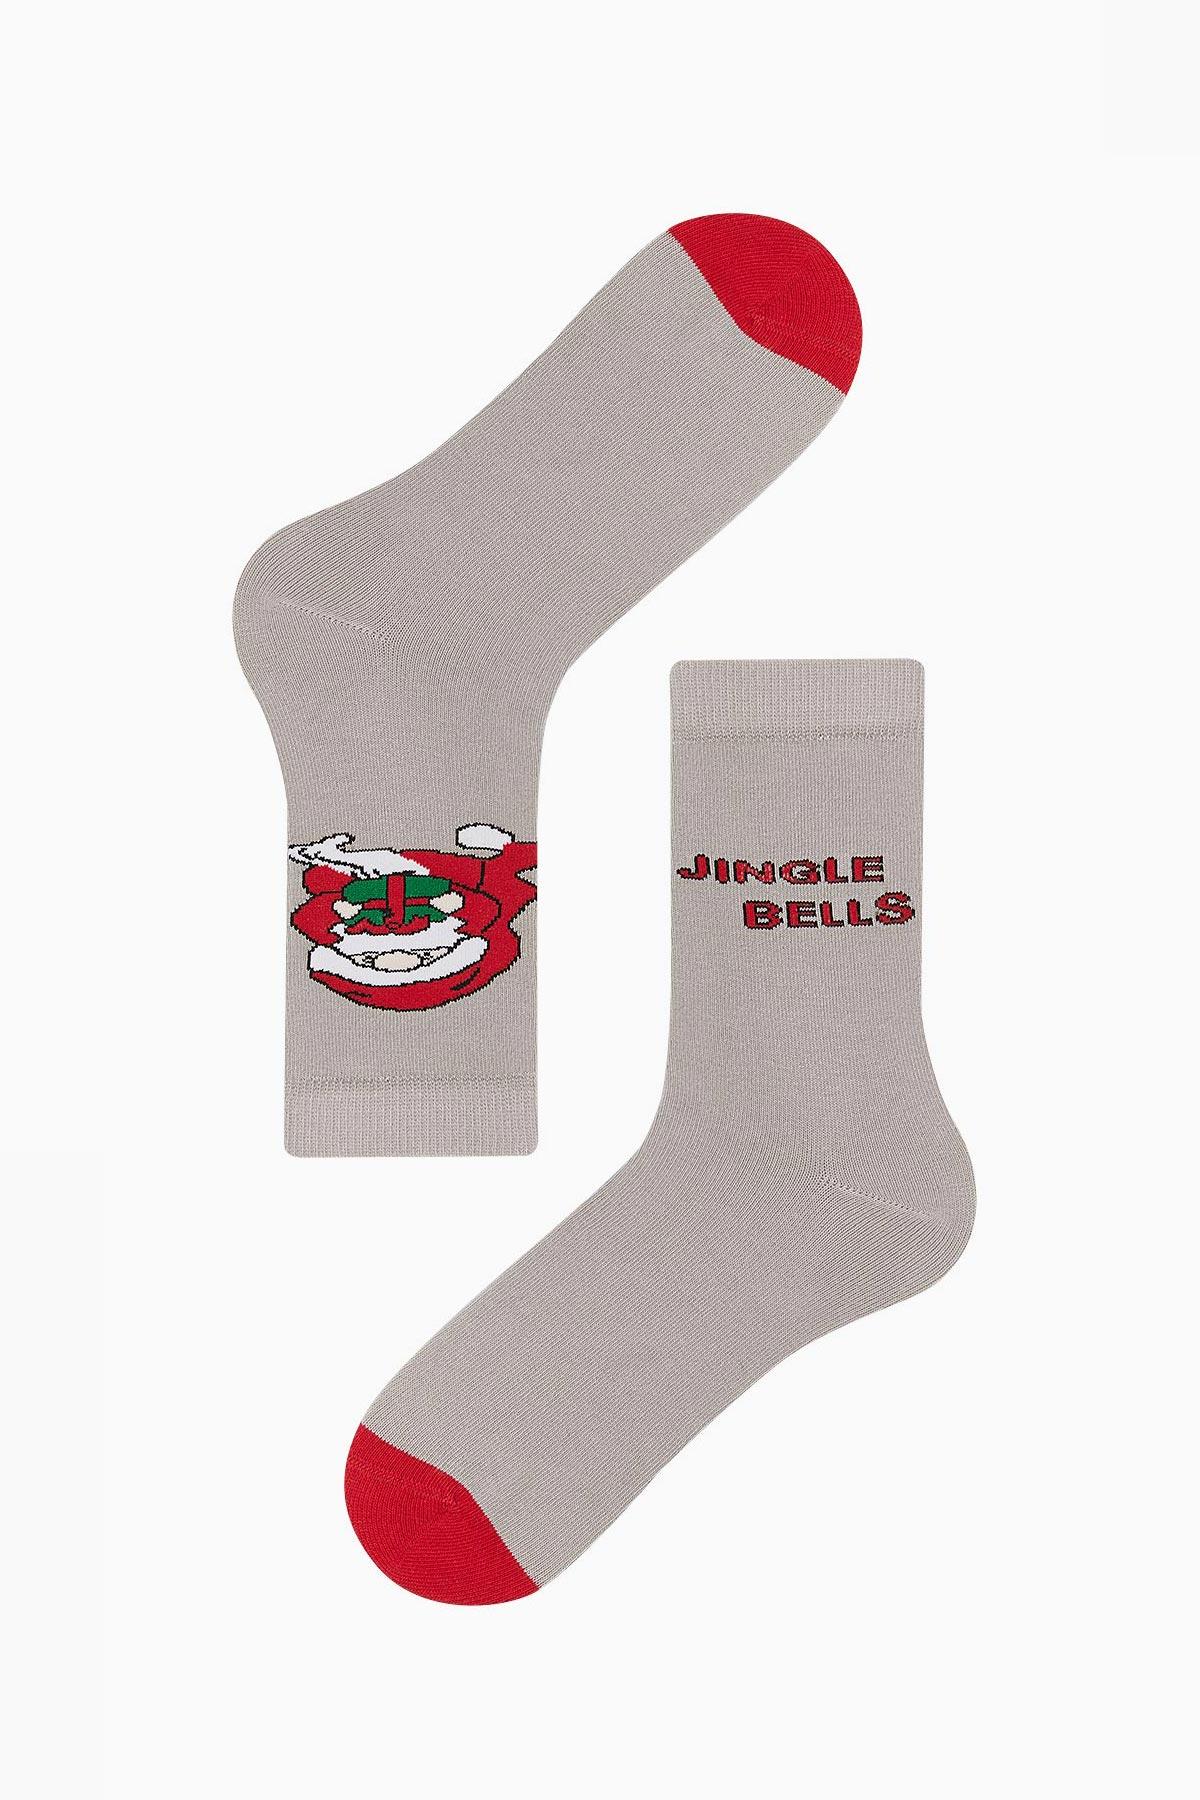 Bross - Bross Jingle Bells Printed Christmas Socks